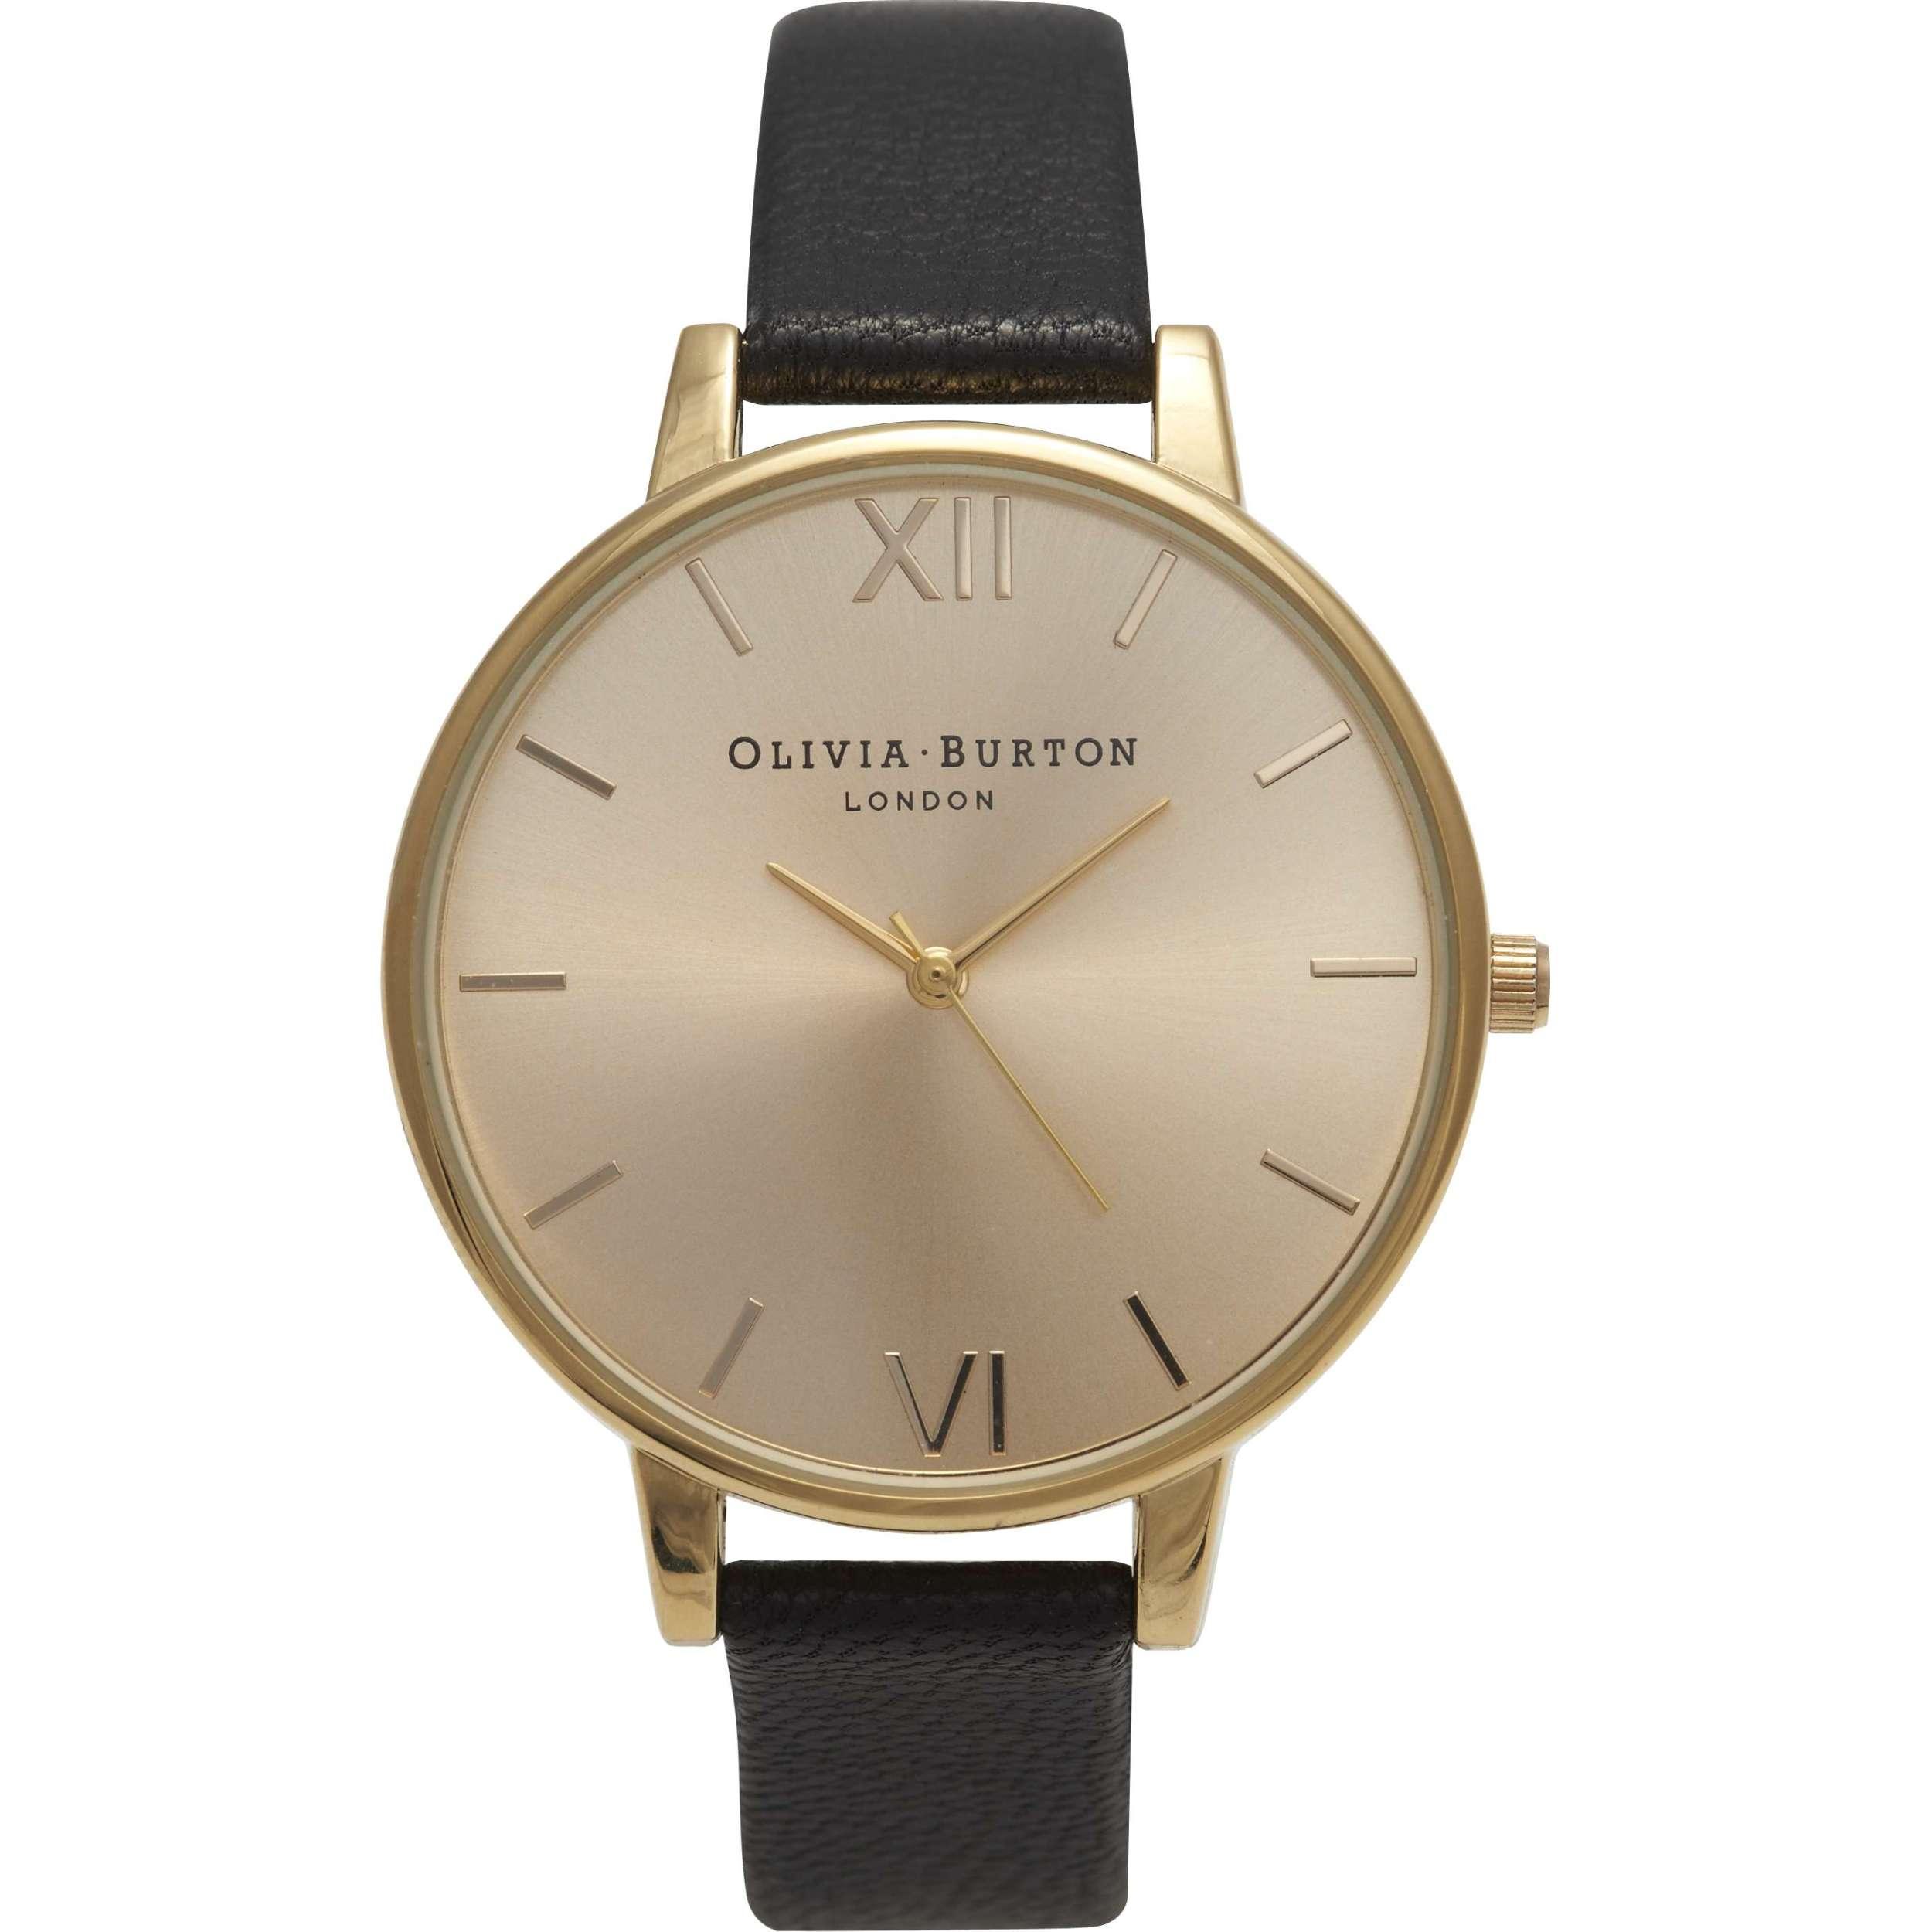 81fa54d5b Ladies Olivia Burton Big Dial Watch (OB13BD06) | WatchShop.com™